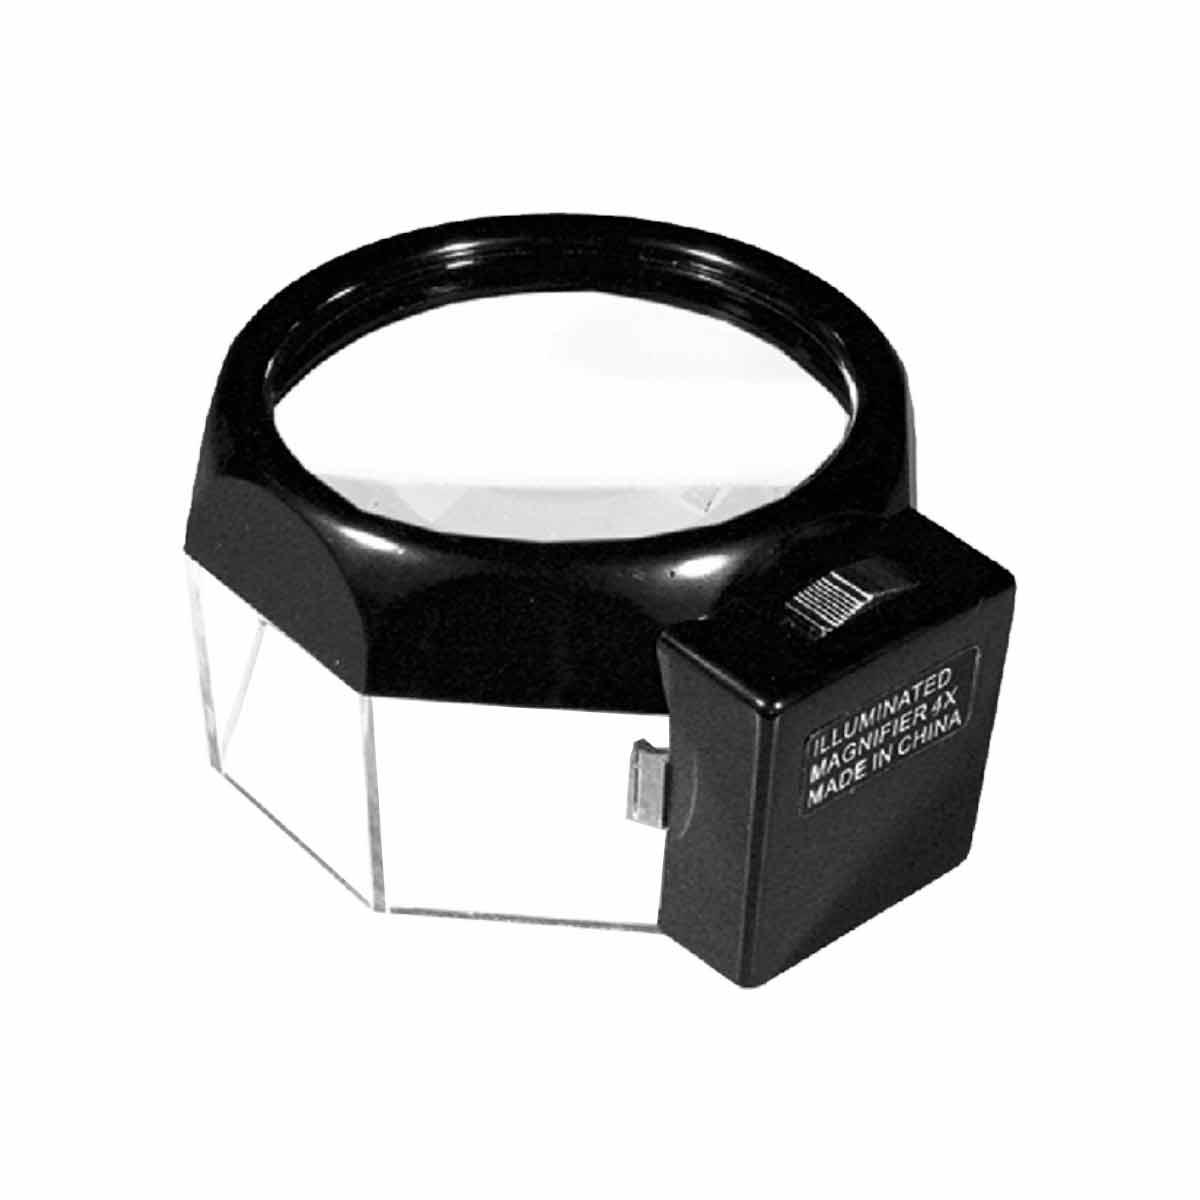 Lupa 85mm c/ Iluminação MG 13104 - CSR